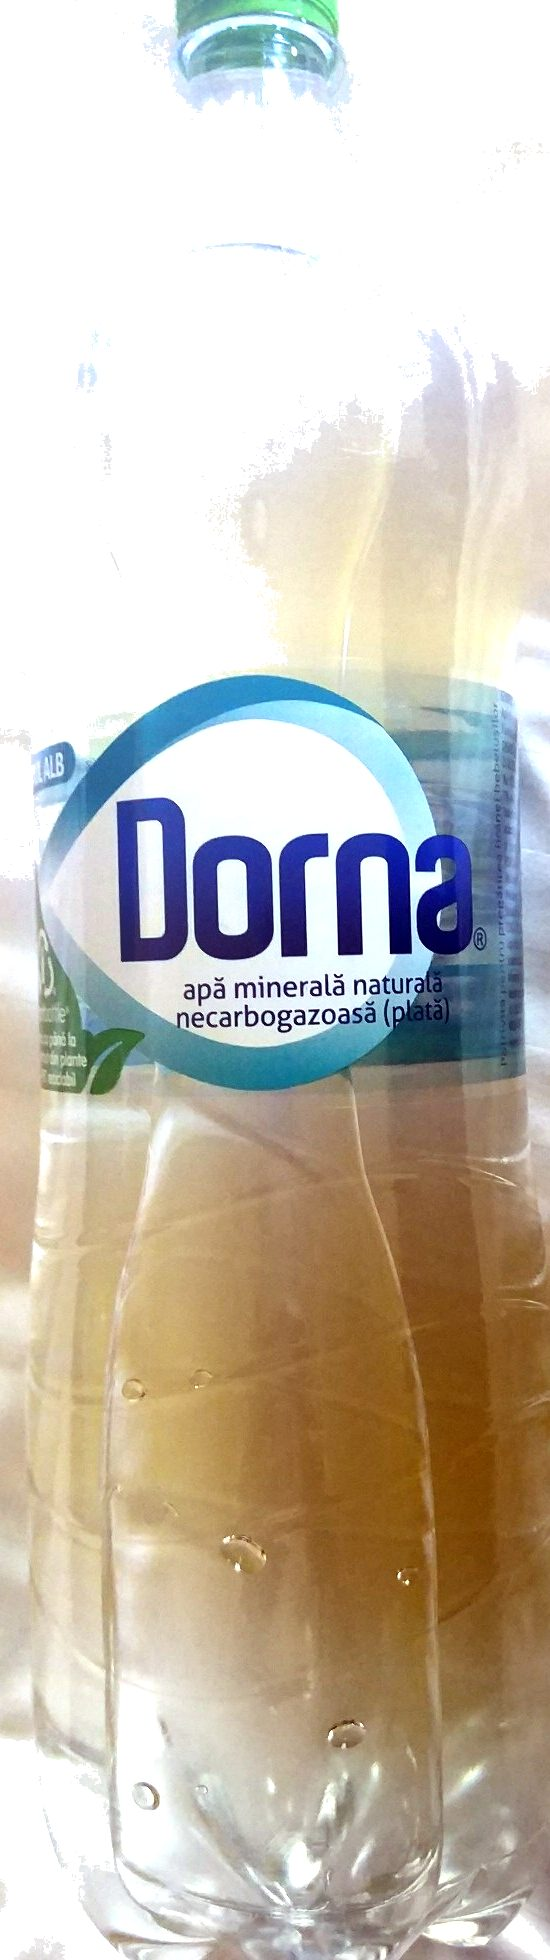 Dorna Apa Minerala Necarbogazoasa (plata) - Producto - ro